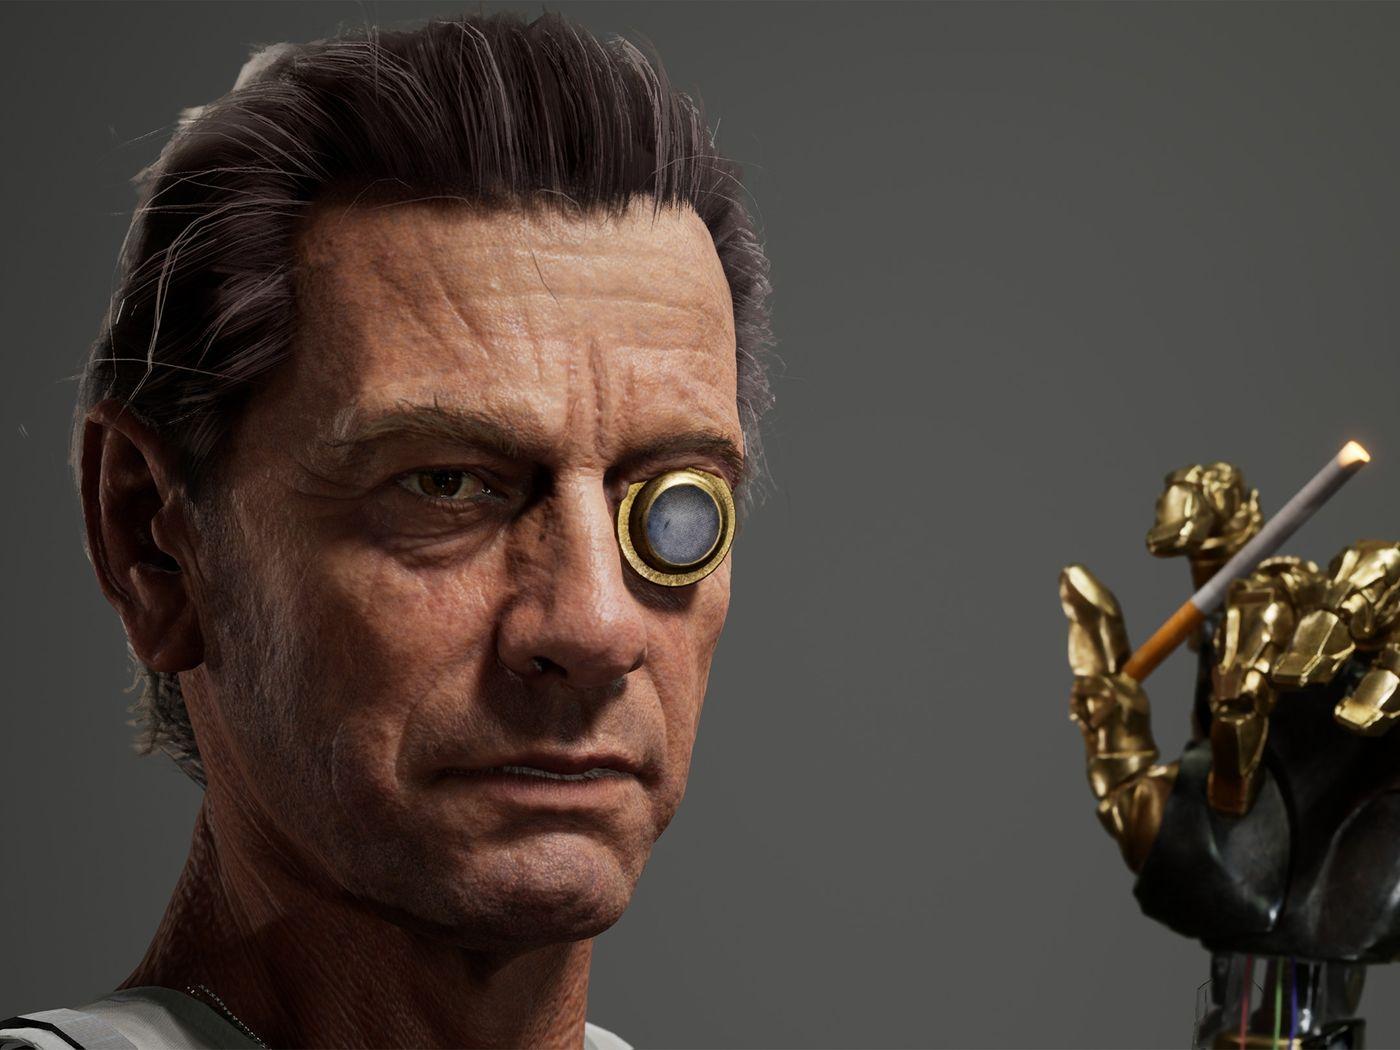 Real-time character art portfolio